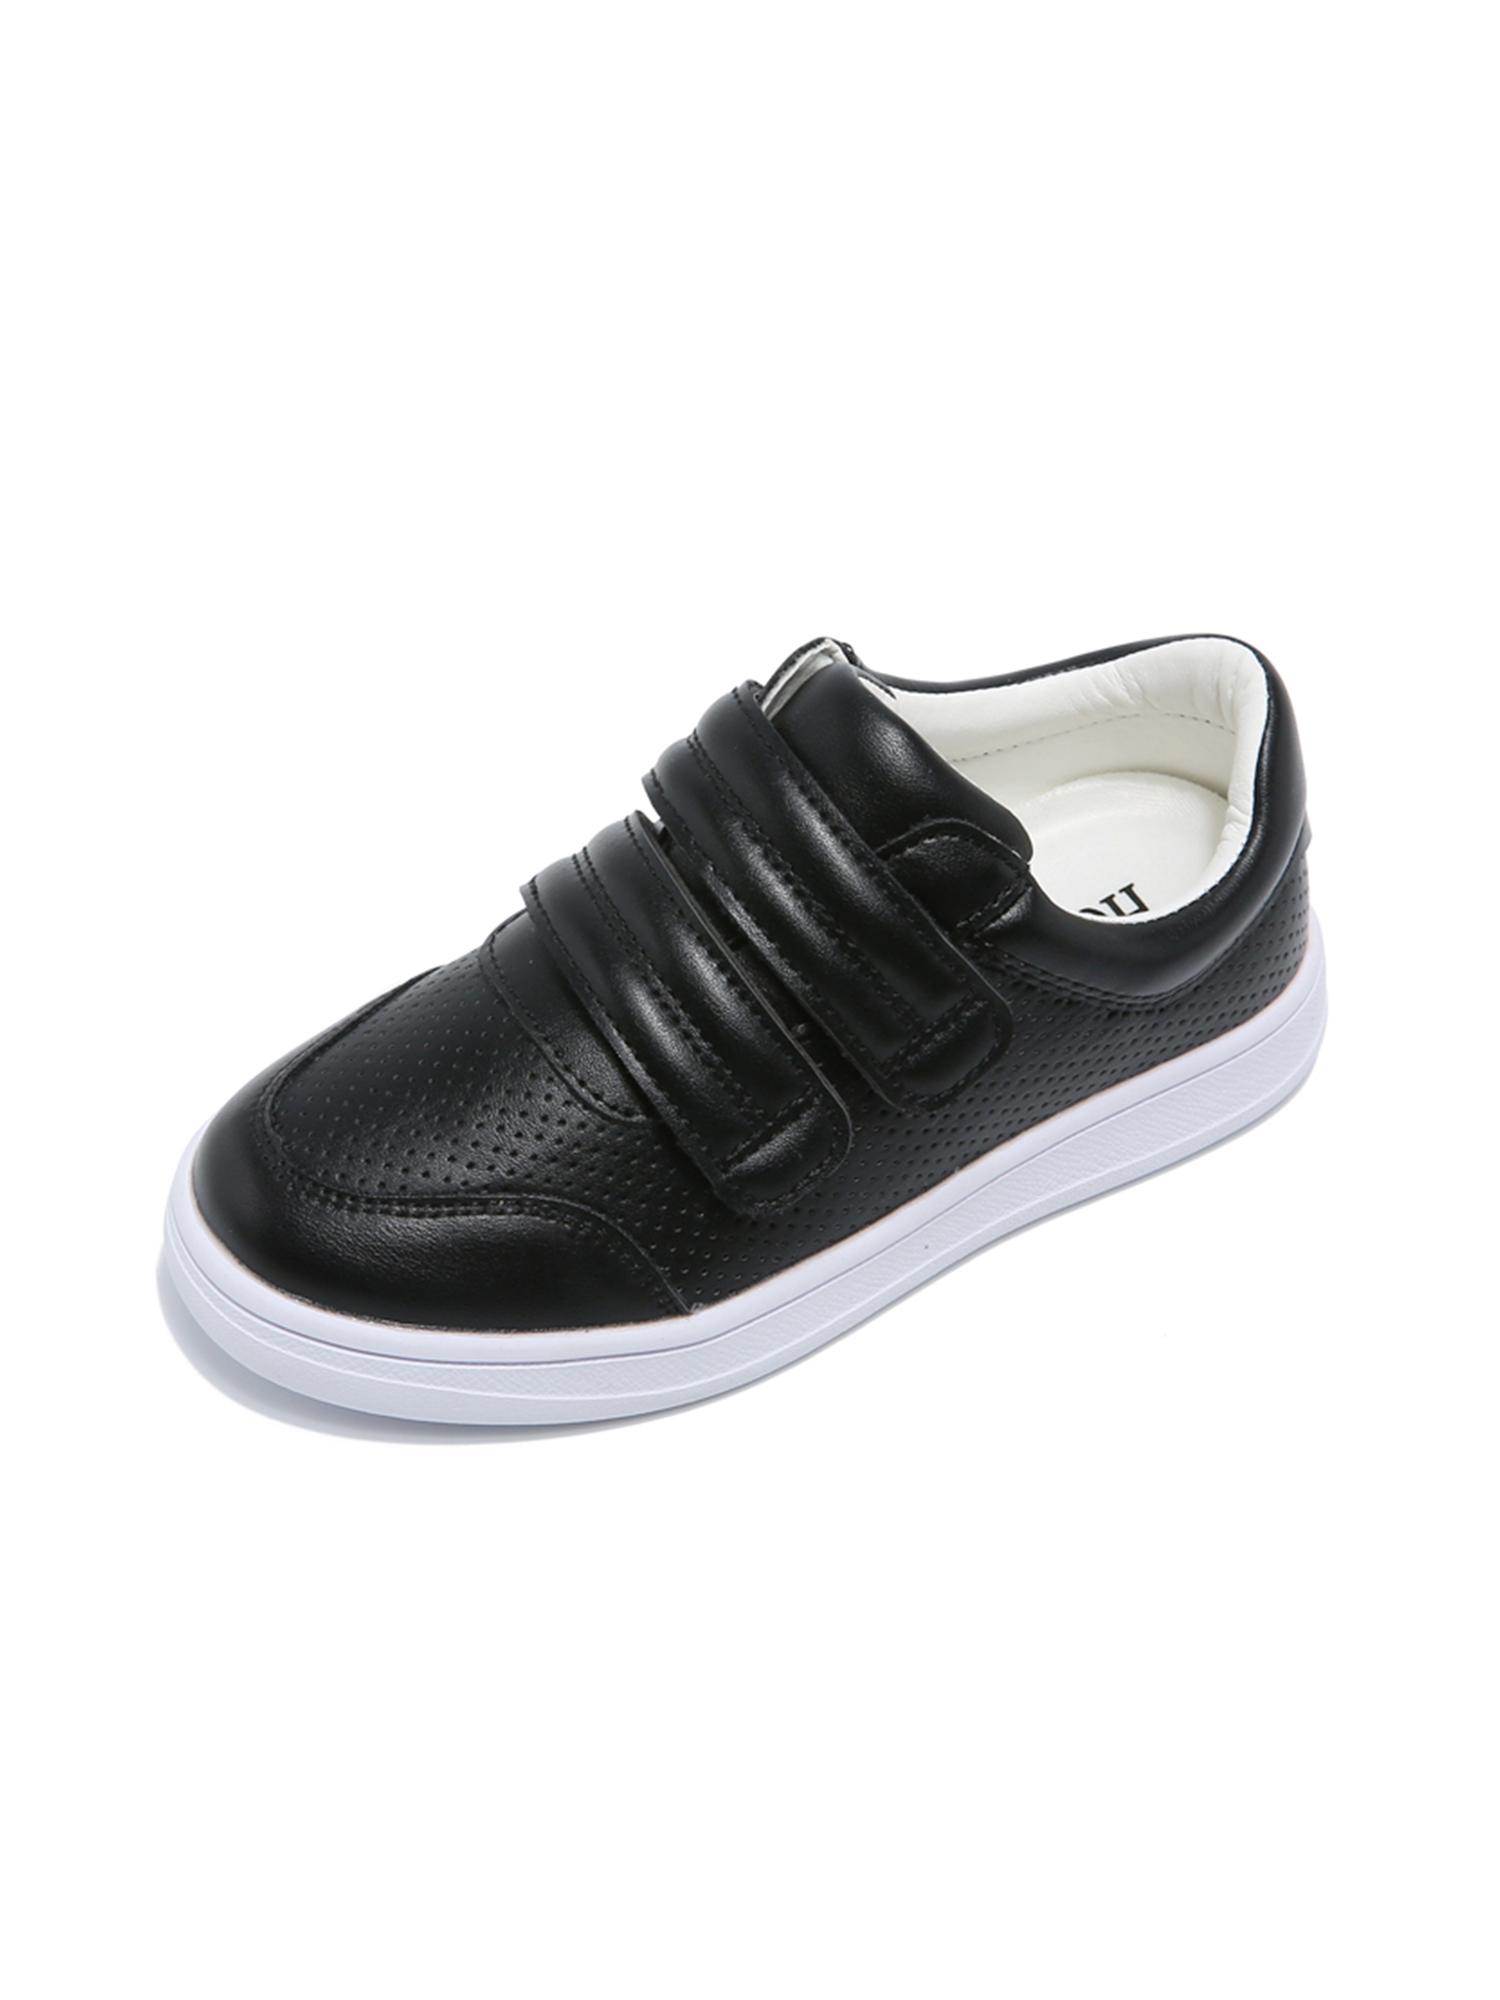 NOEL Boys Kids Rodin Grey Zips /& Laces Leather Trainers 5Y044423E